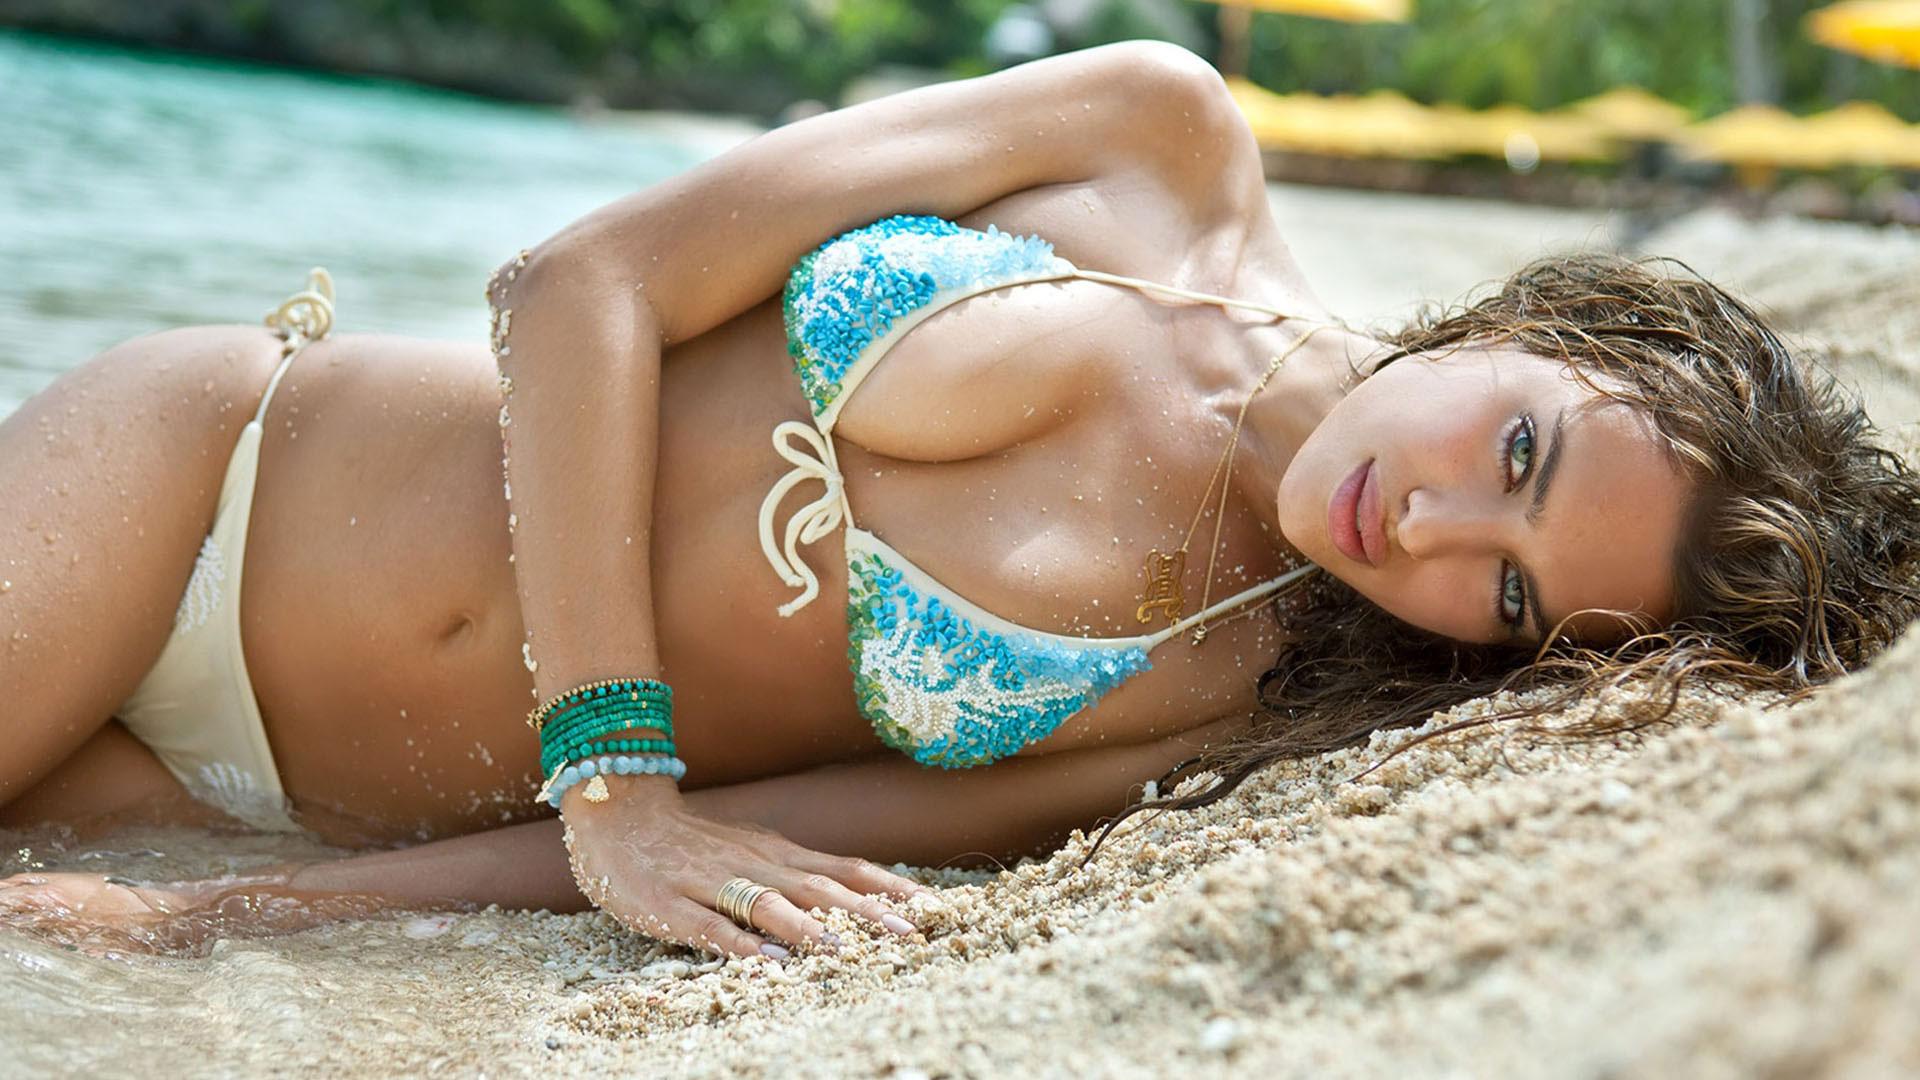 фото морская нимфа ххх